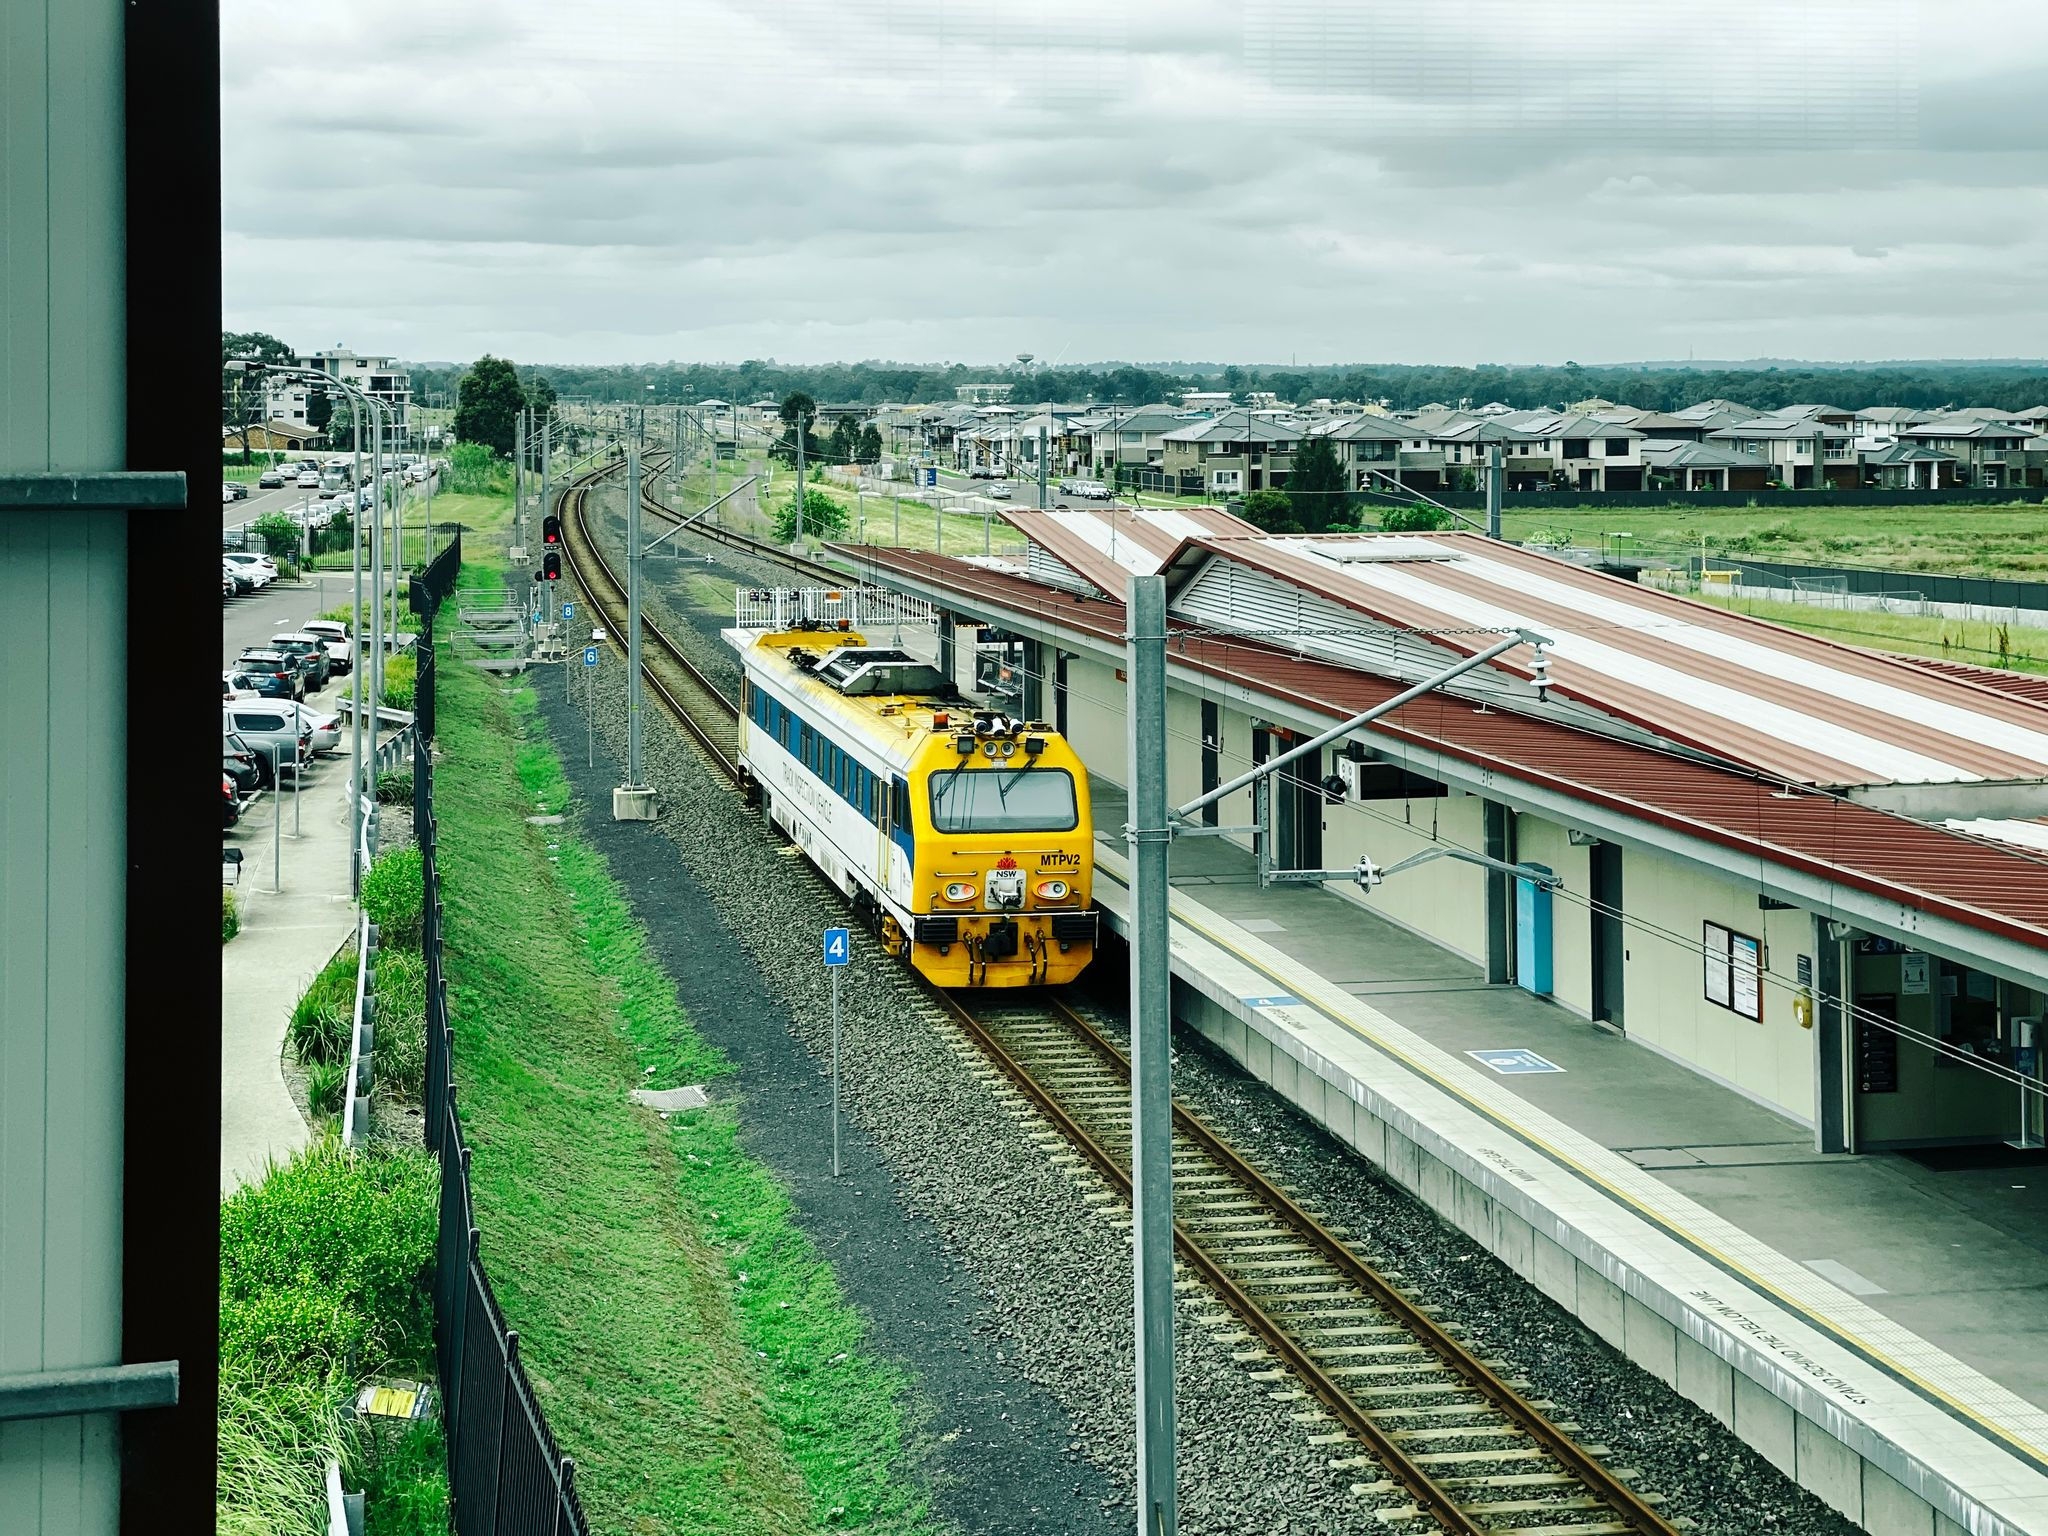 A photo of a train track inspection vehicle sitting alongside a train platform.